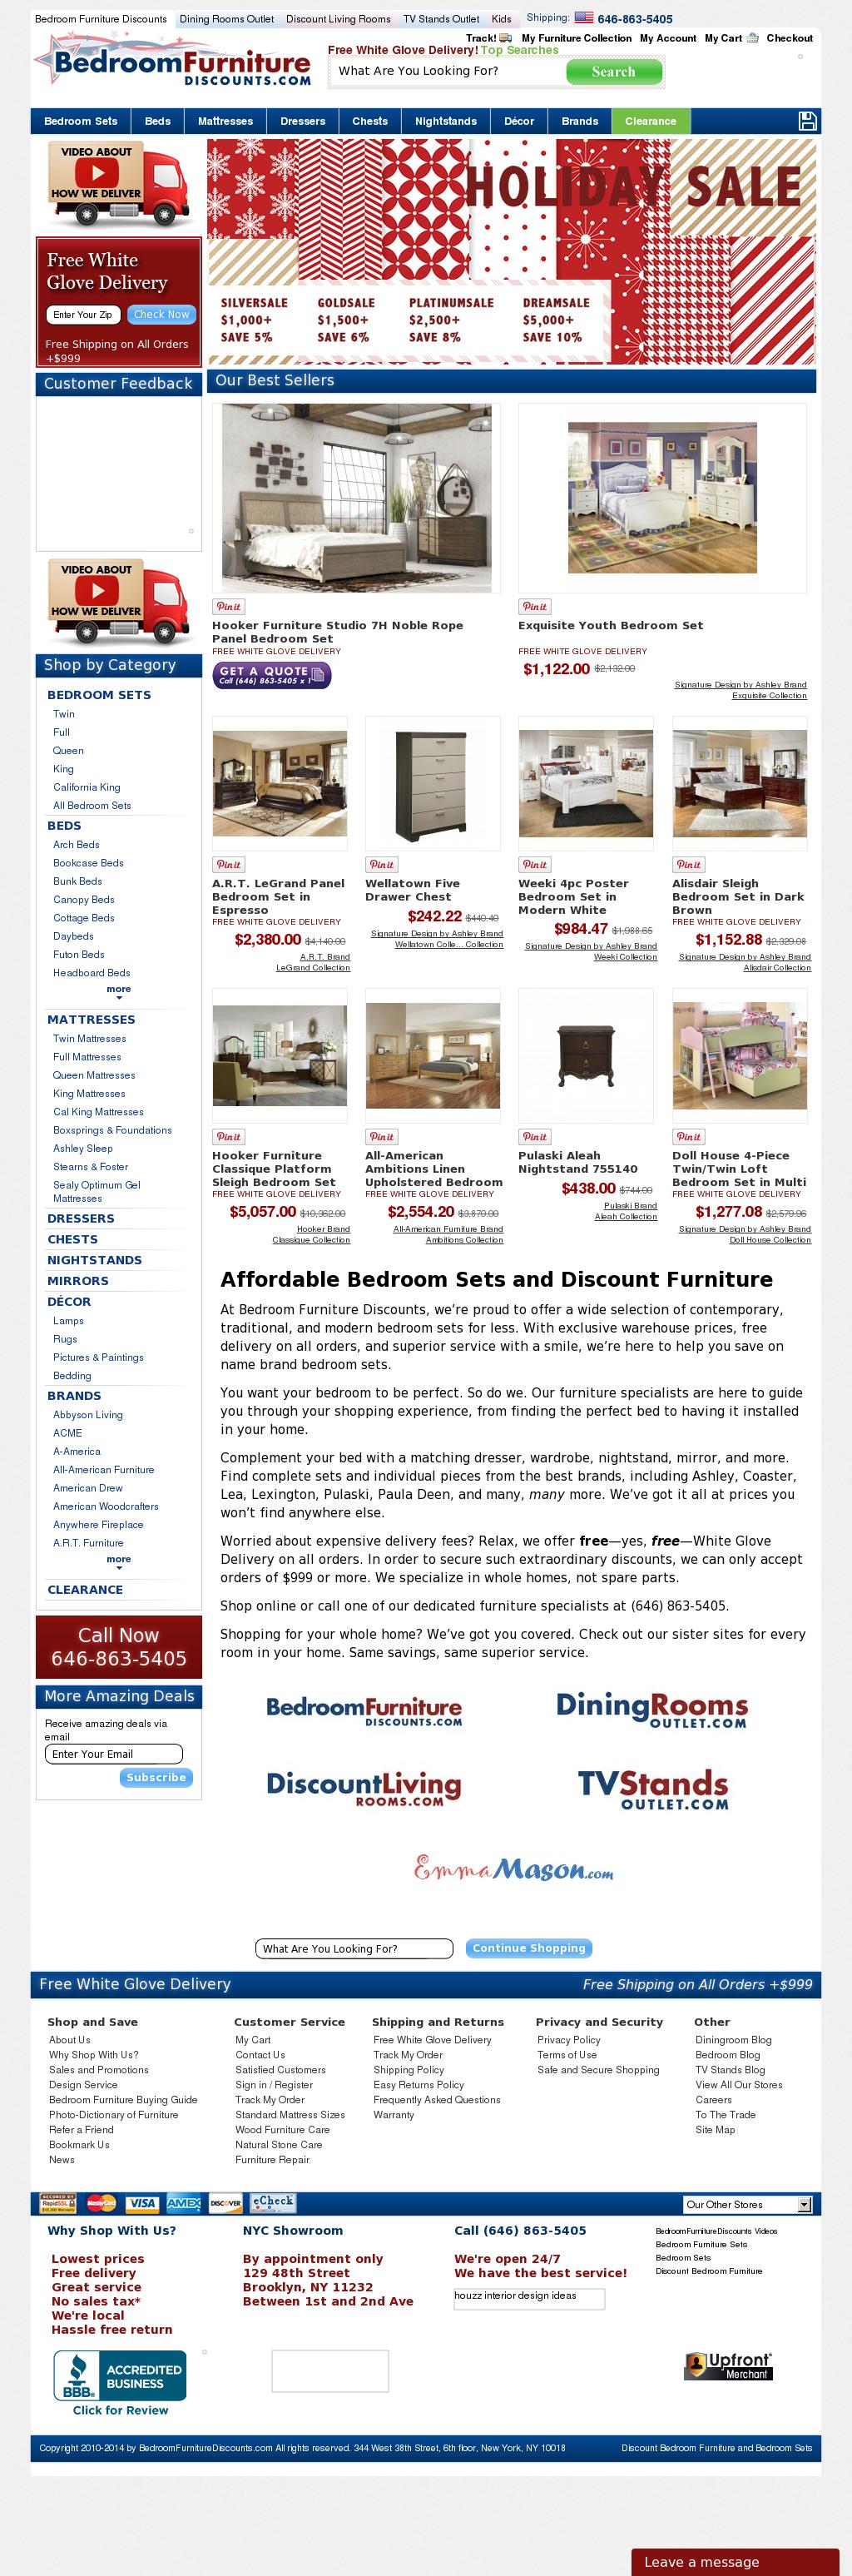 Bedroom Furniture Discounts Competitors, Revenue and ...